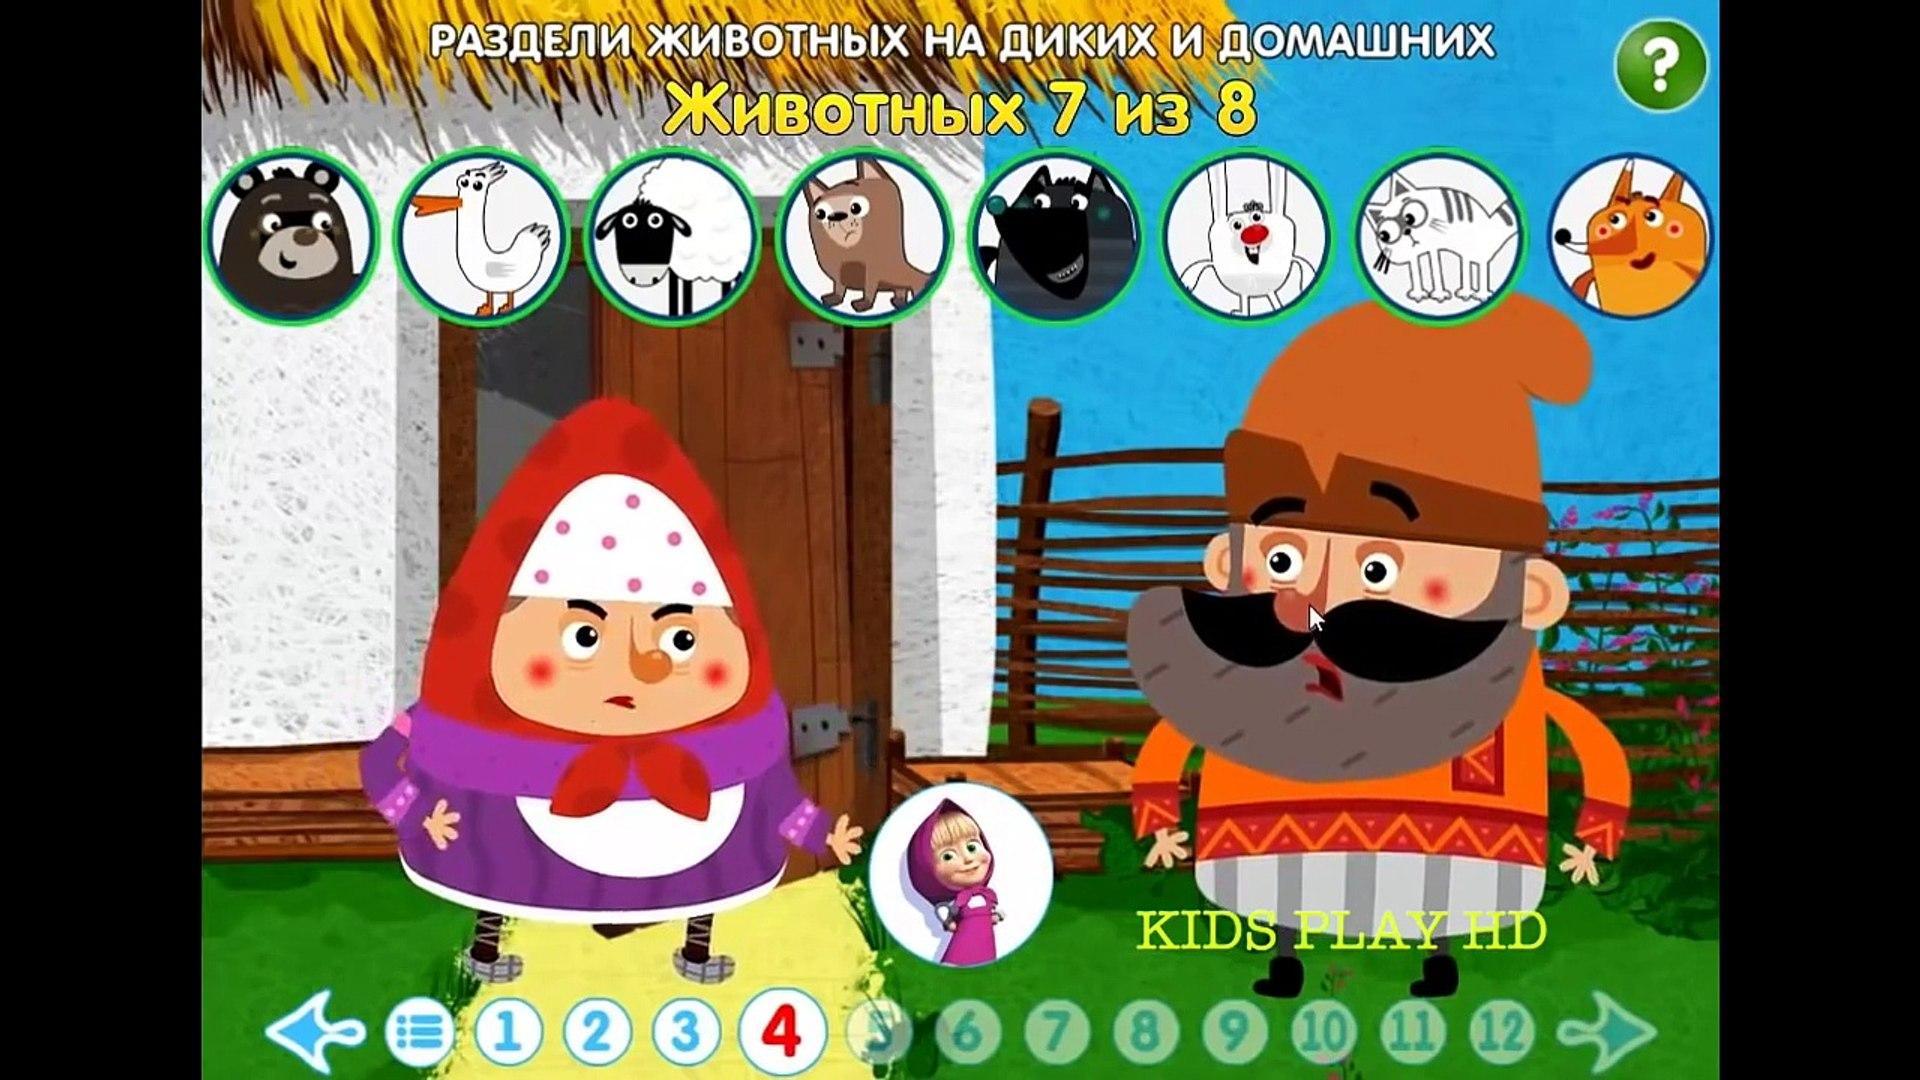 GAME MASHA AND THE BEAR | Маша и Медведь 2016 | Маша и Медведь Игра | Маша и Медведь Новые Сказки